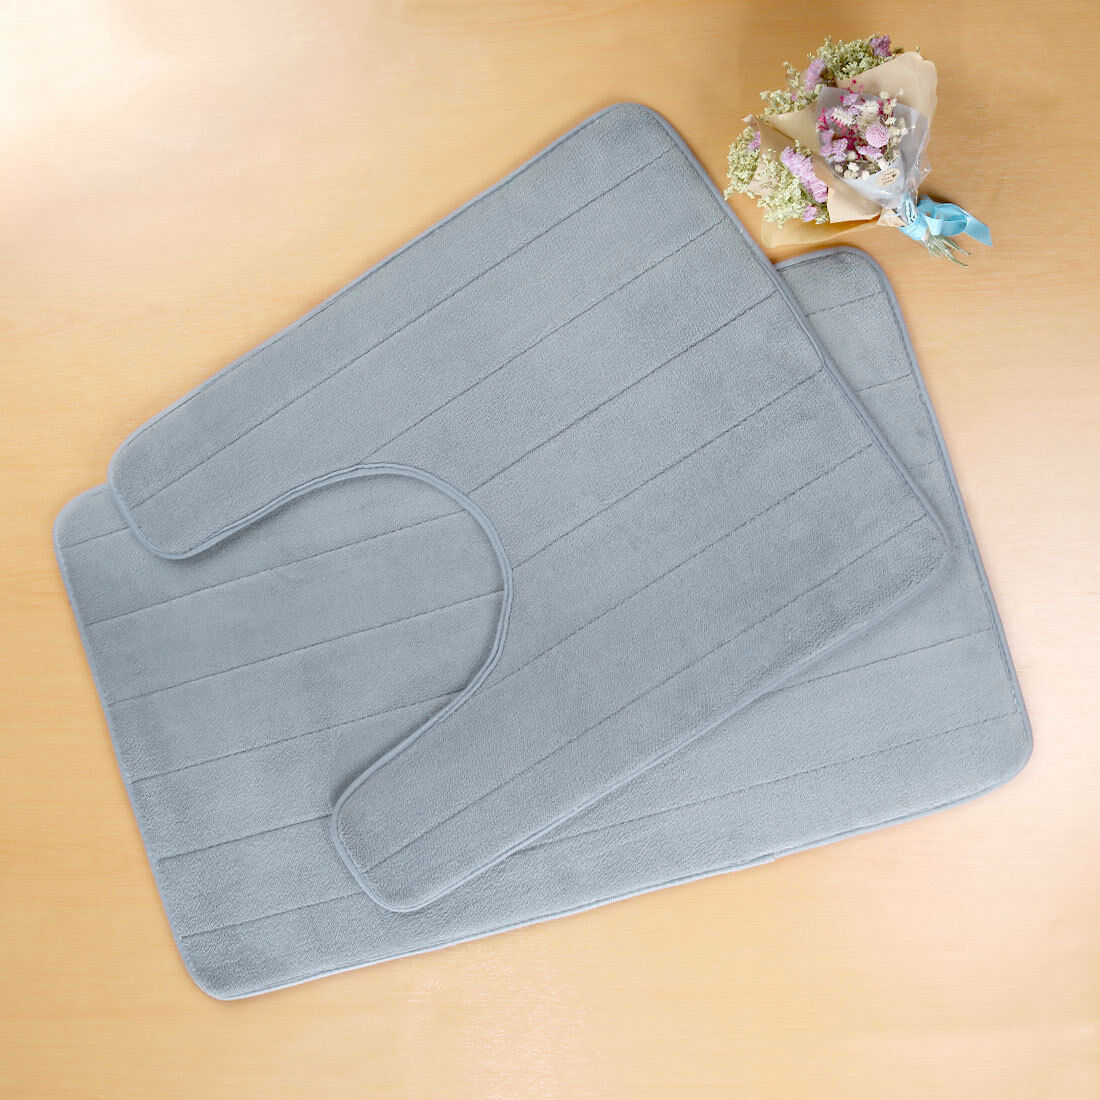 2PCS Non-Slip Bathroom Rug Mat Memory Foam Contour Floor Rug Carpet Pad Sets